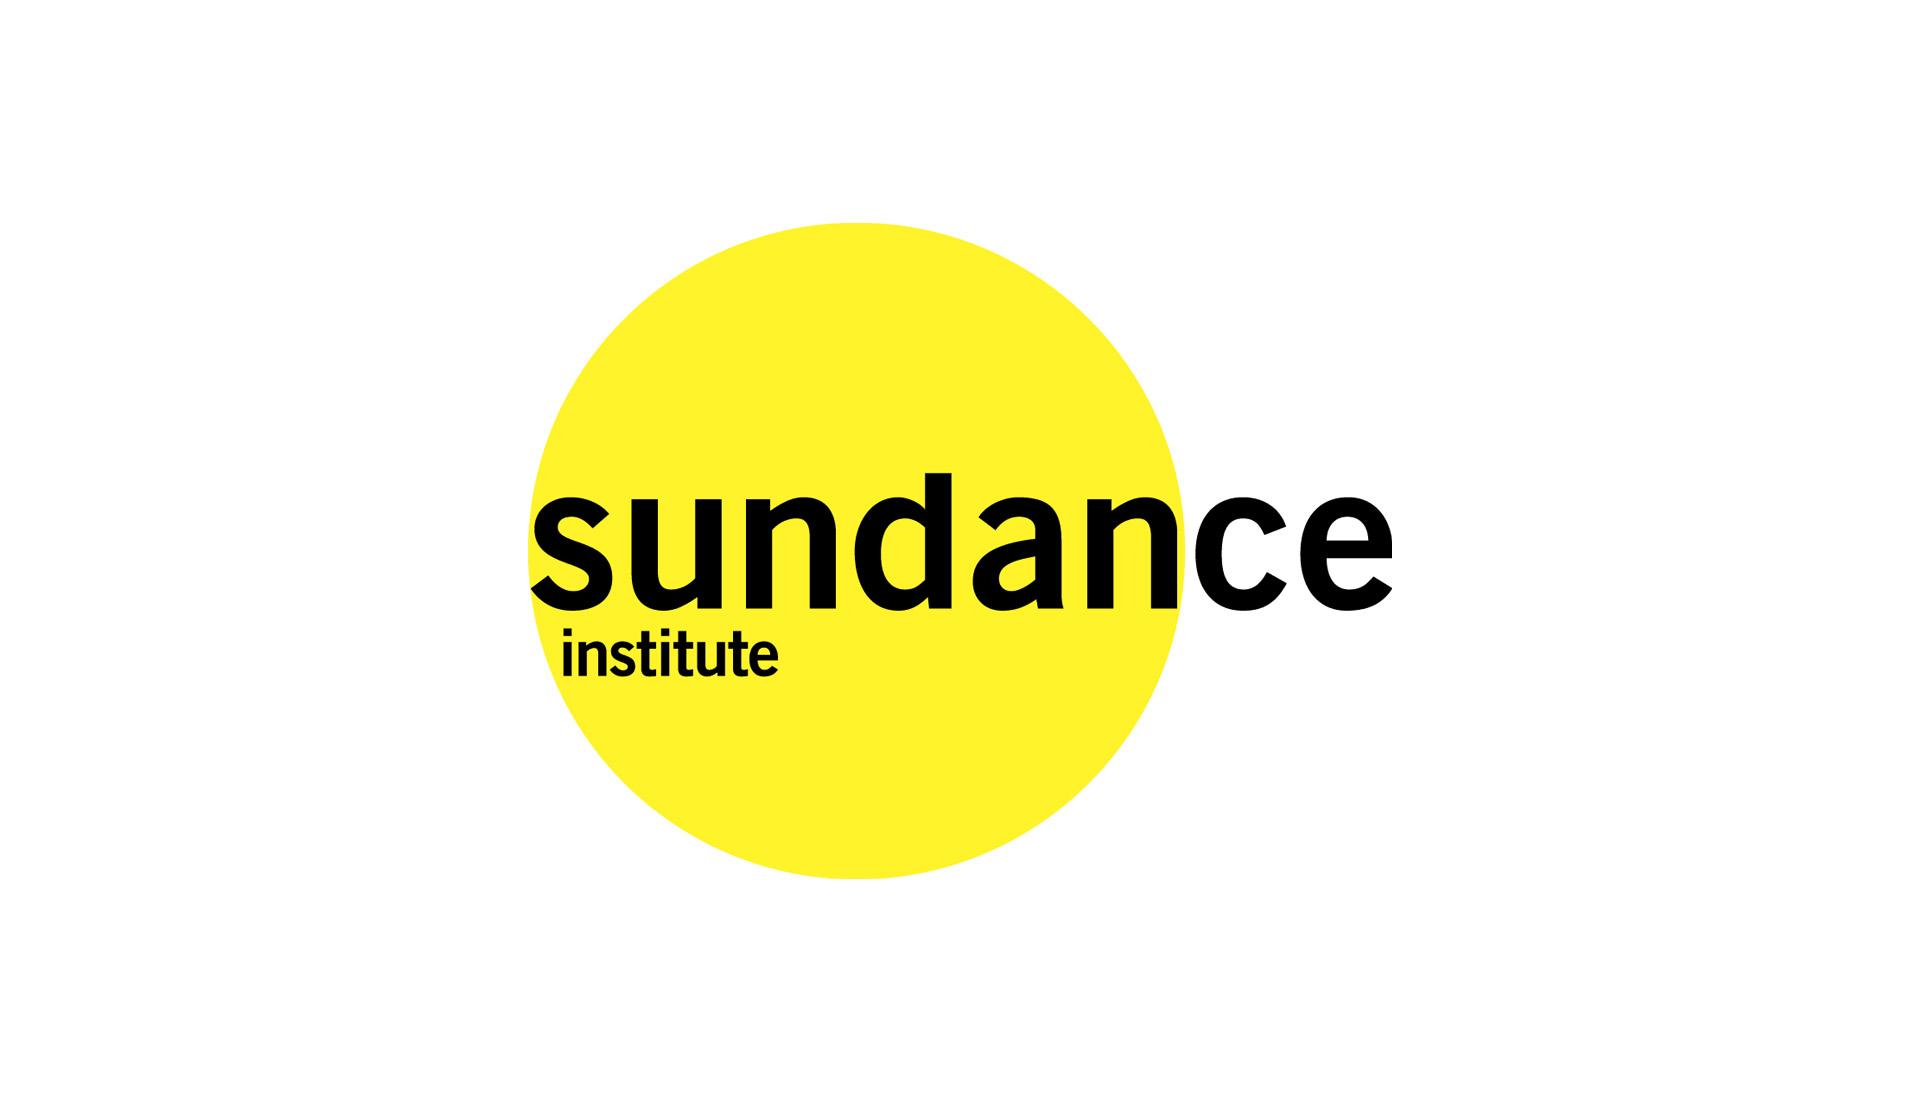 sundance-institute.jpg